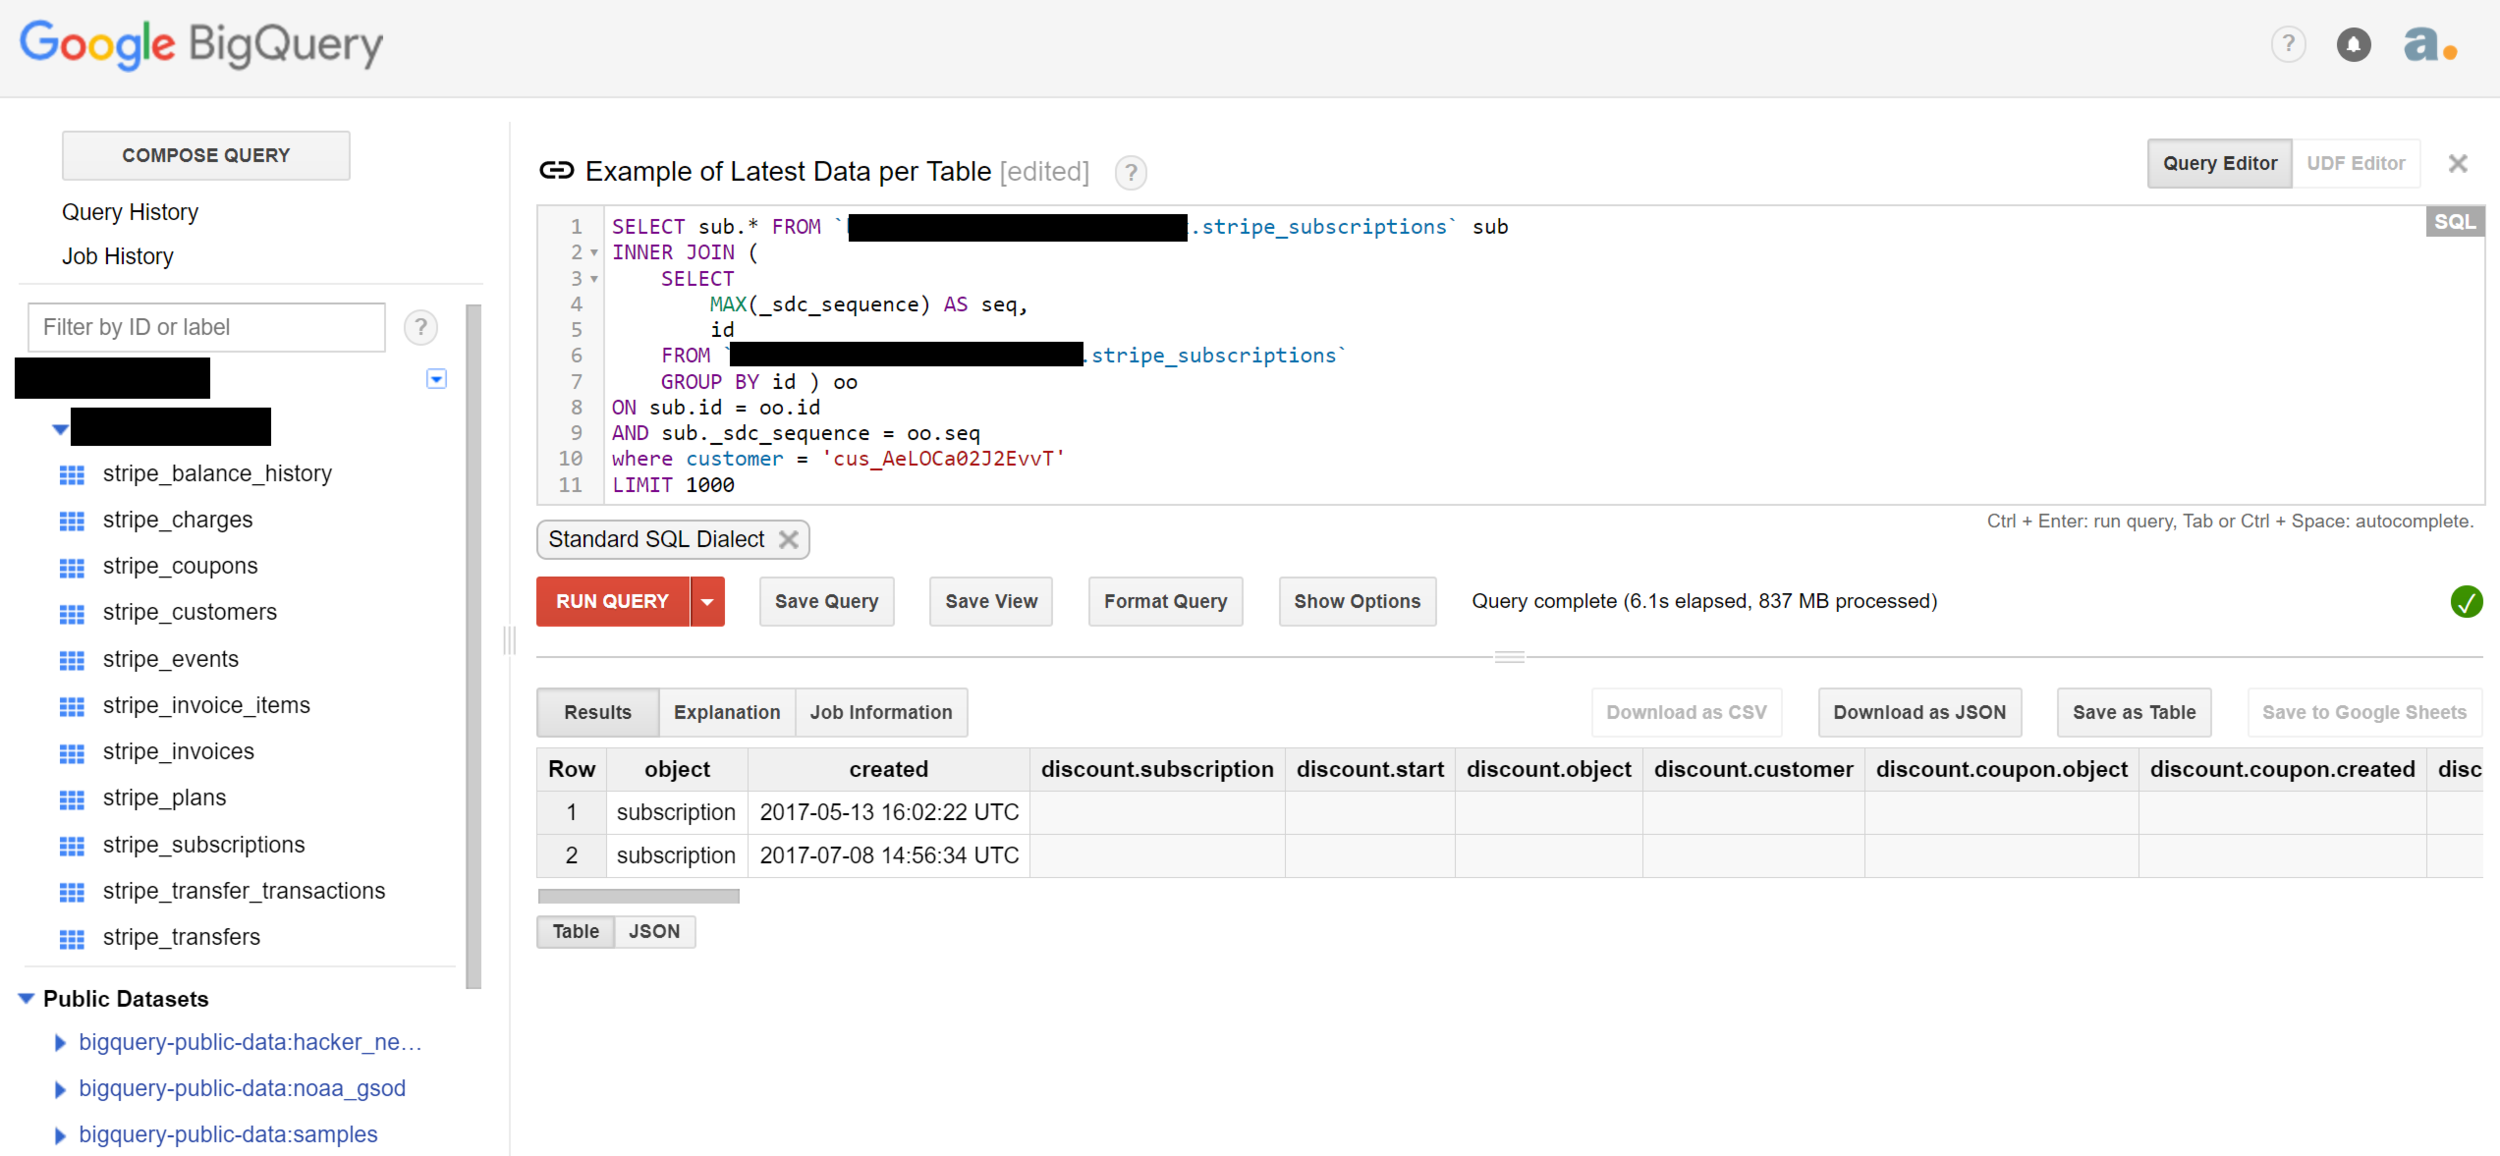 Figure           SEQ Figure \* ARABIC       5        : Google BigQuery – SQL Query Editor. Schema names have been redacted